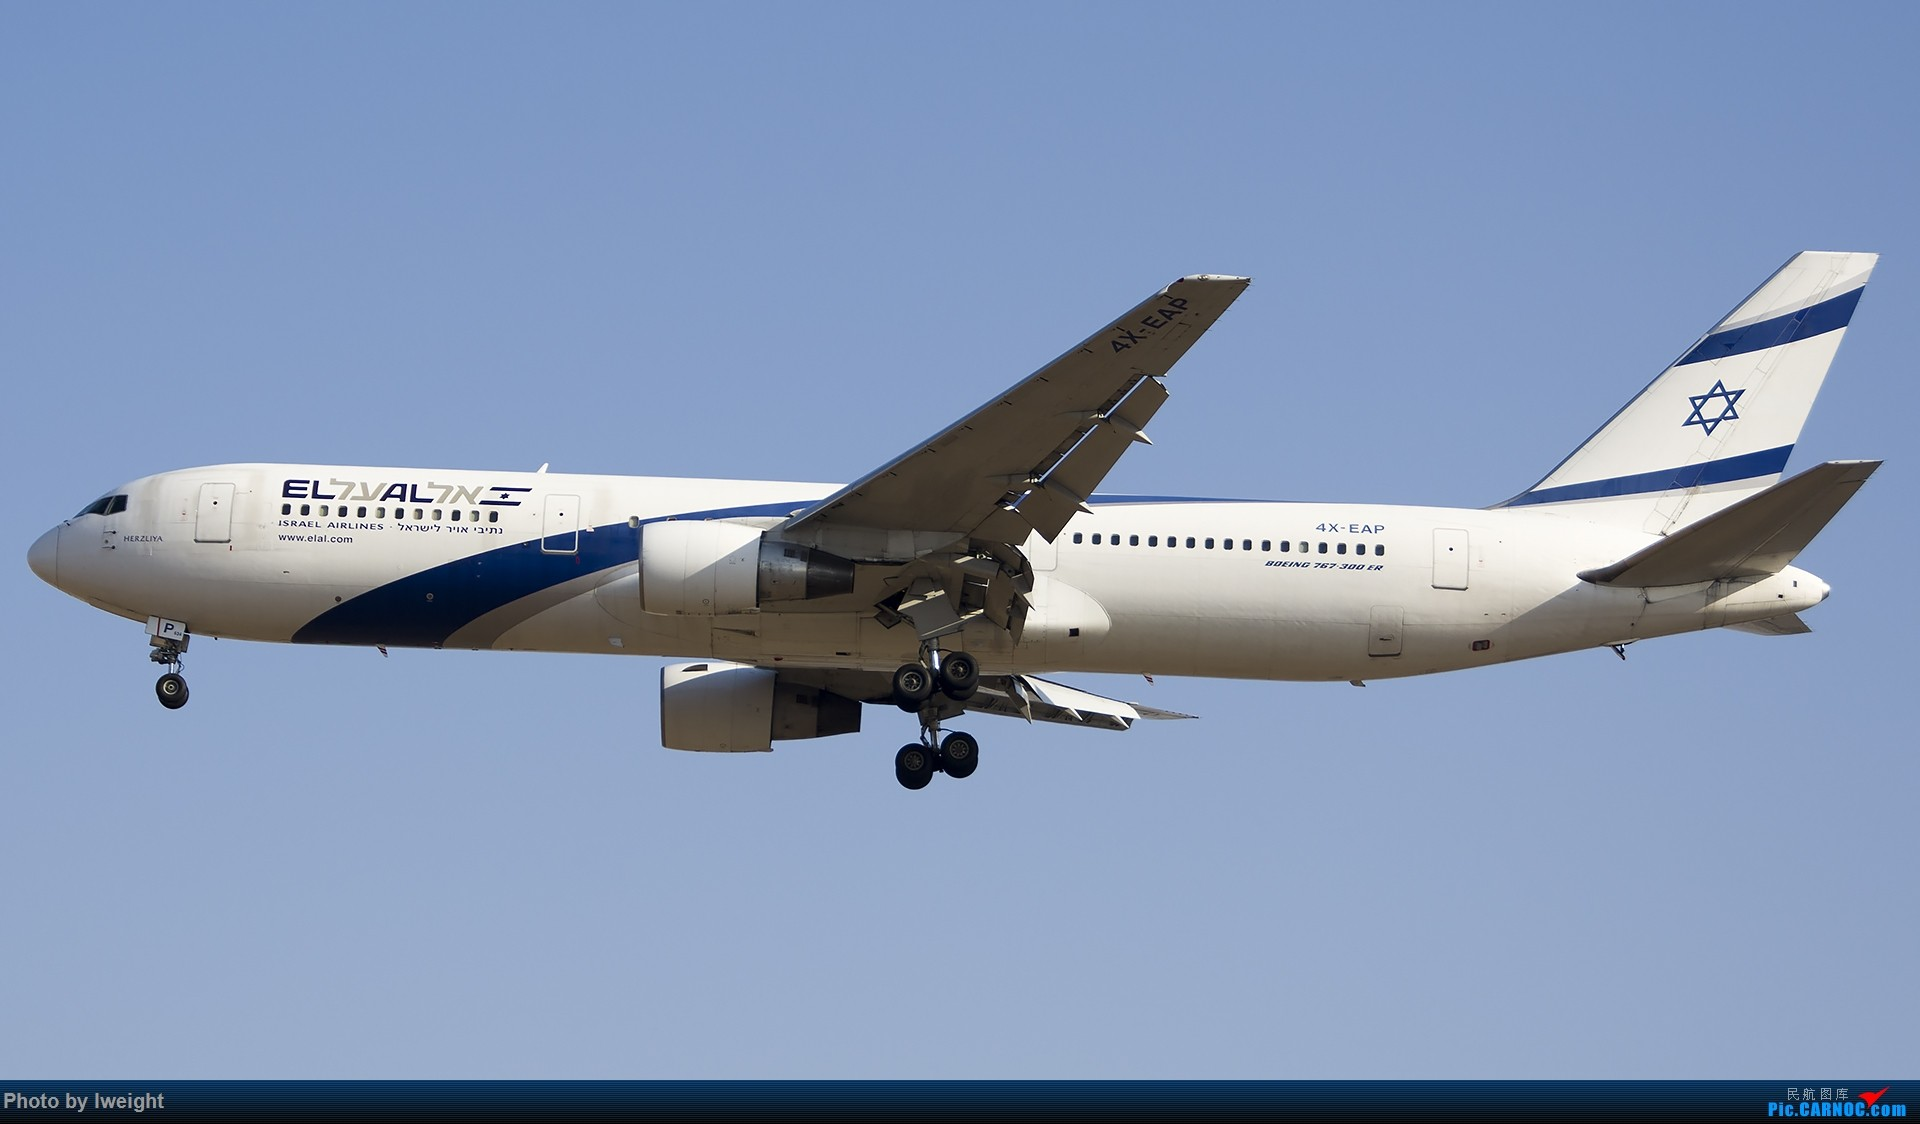 Re:[原创]庆祝升级777,发上今天在首都机场拍的所有飞机【2014-12-14】 BOEING 767-300ER 4X-EAP 中国北京首都国际机场